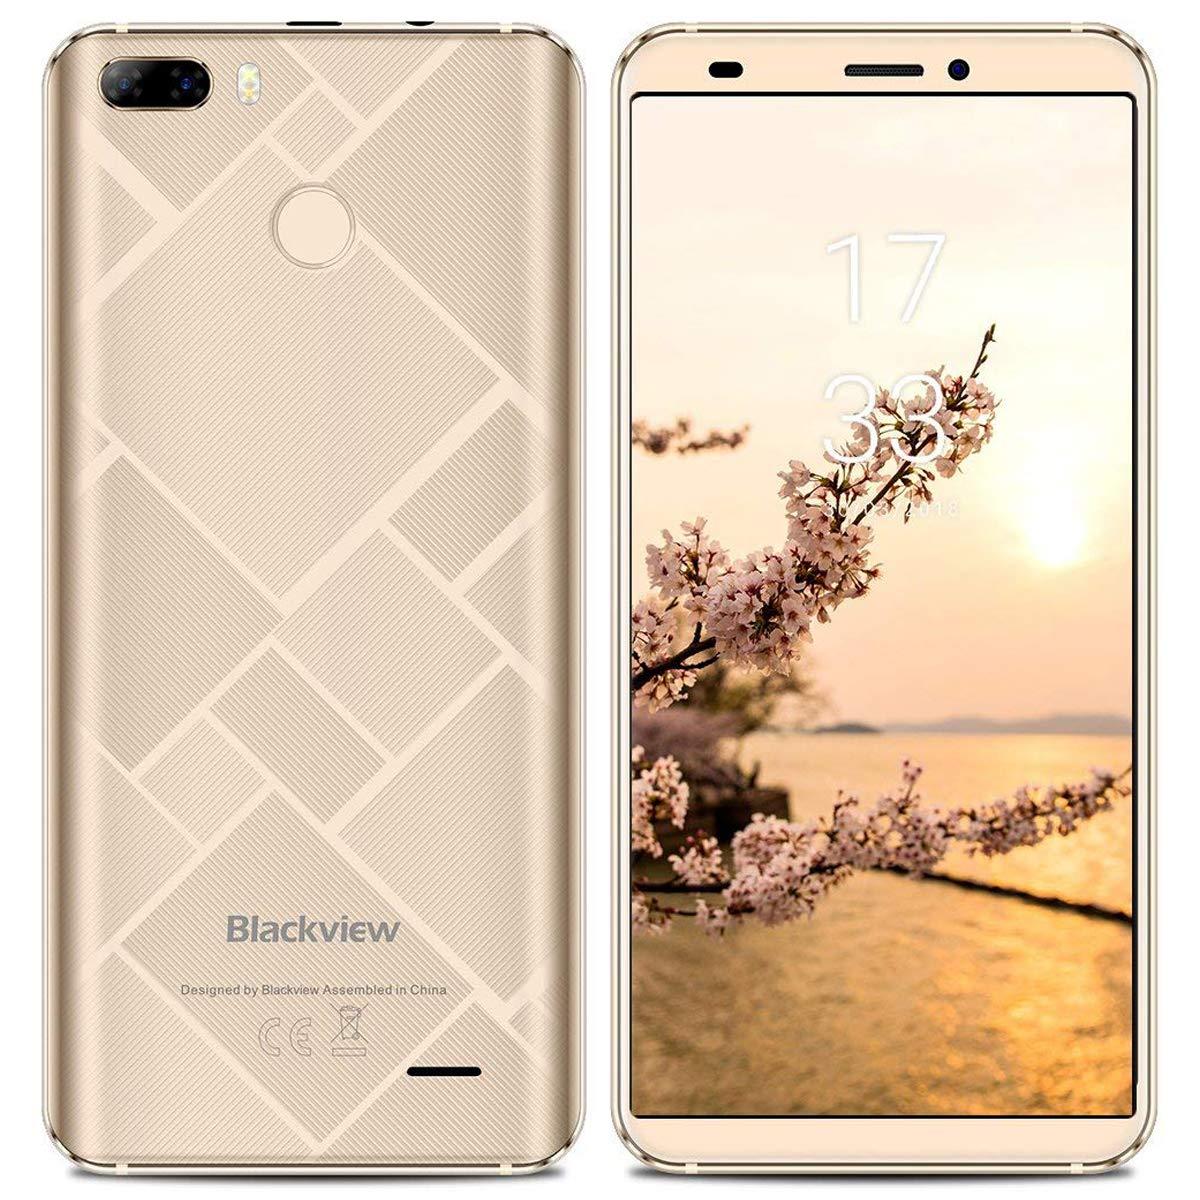 "Blackview S6 - Smartphone Libre de 5.7"" 18:9 HD (Octa Core 2GB RAM + 16GB ROM, Cámaras Dobles Traseras de 8MP+0.3MP, Android 7.0, Batería 4180mAh, ..."